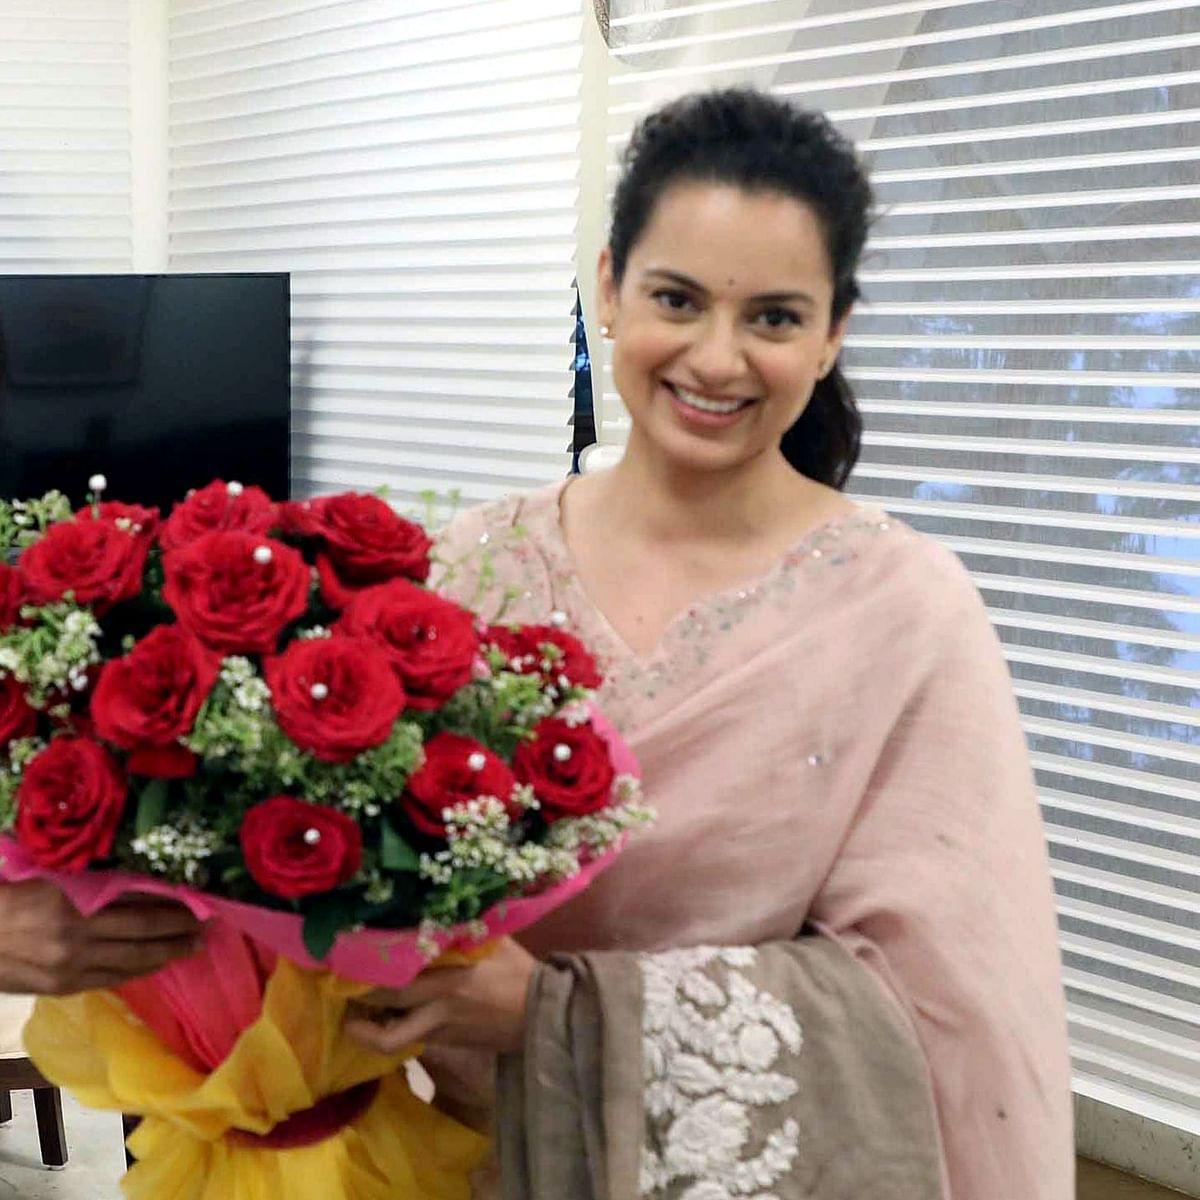 Betul: Digvijaya Singh asks who is Kangana after Congress MLA calls her 'nachne gaane waali'